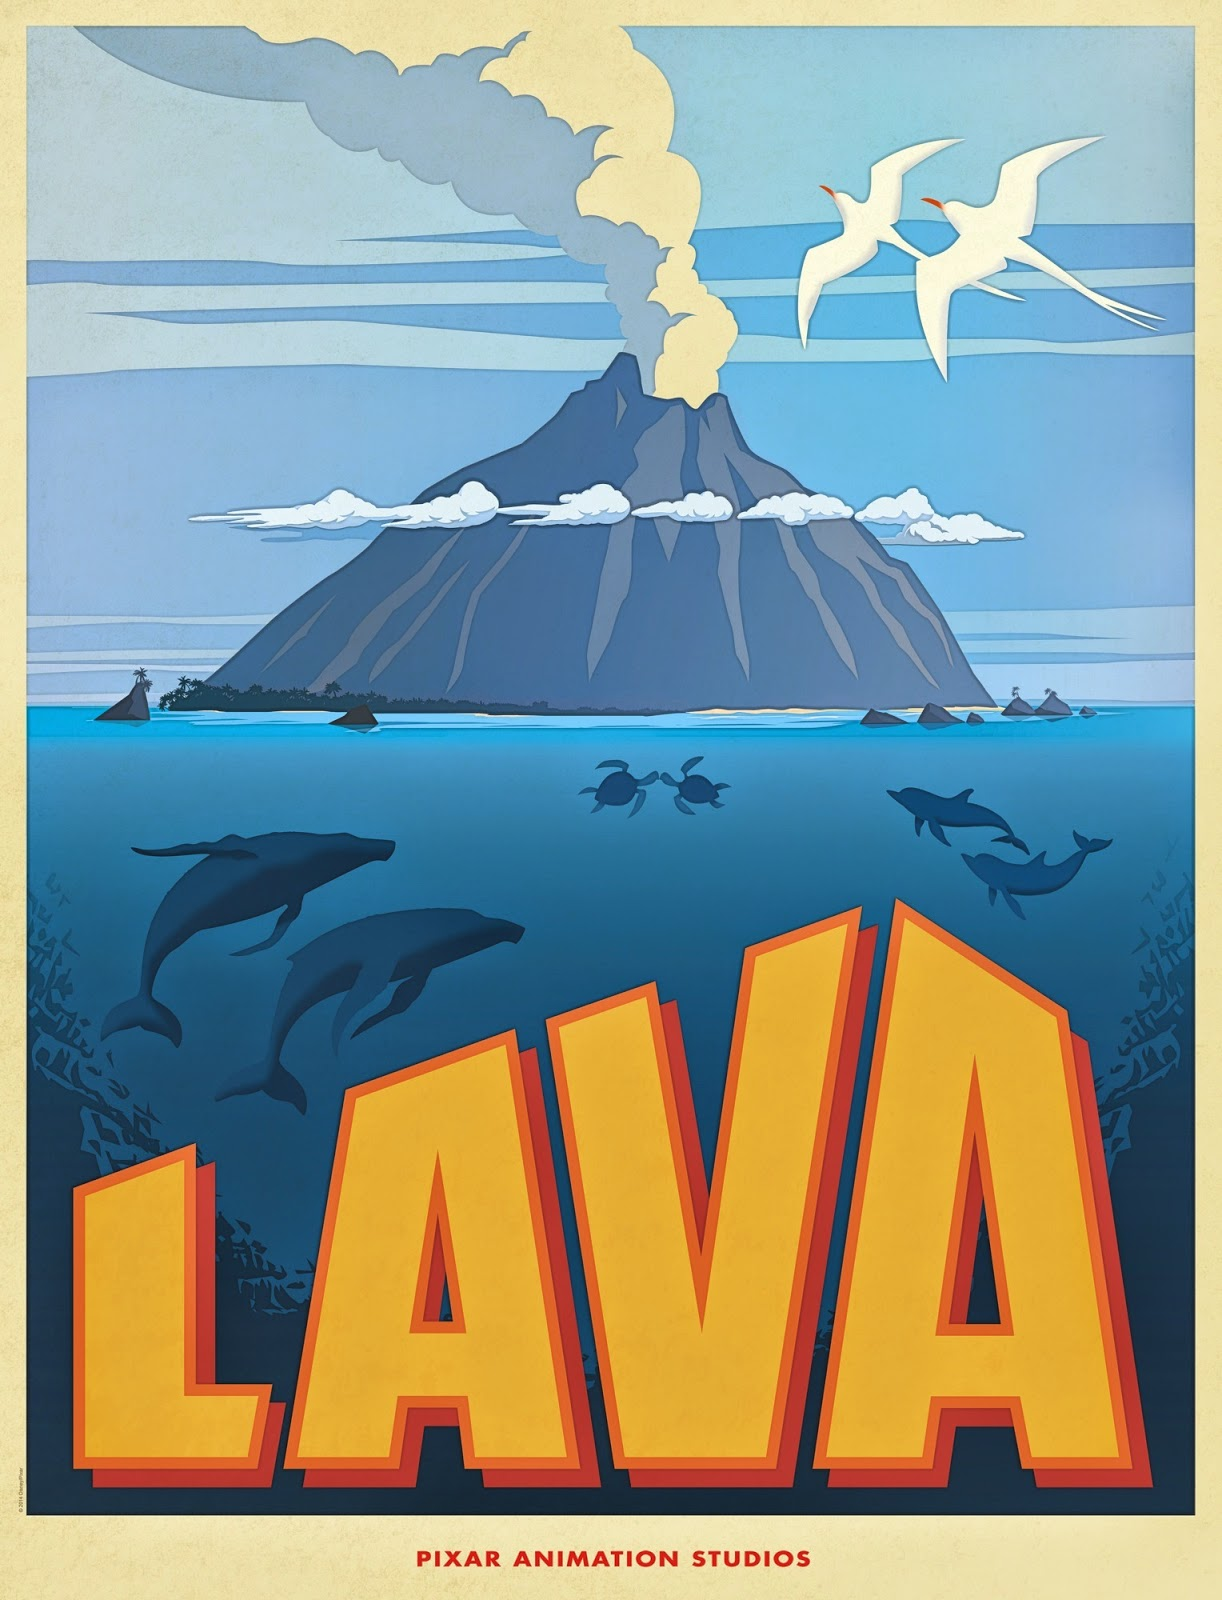 Pixar Short Lava Poster